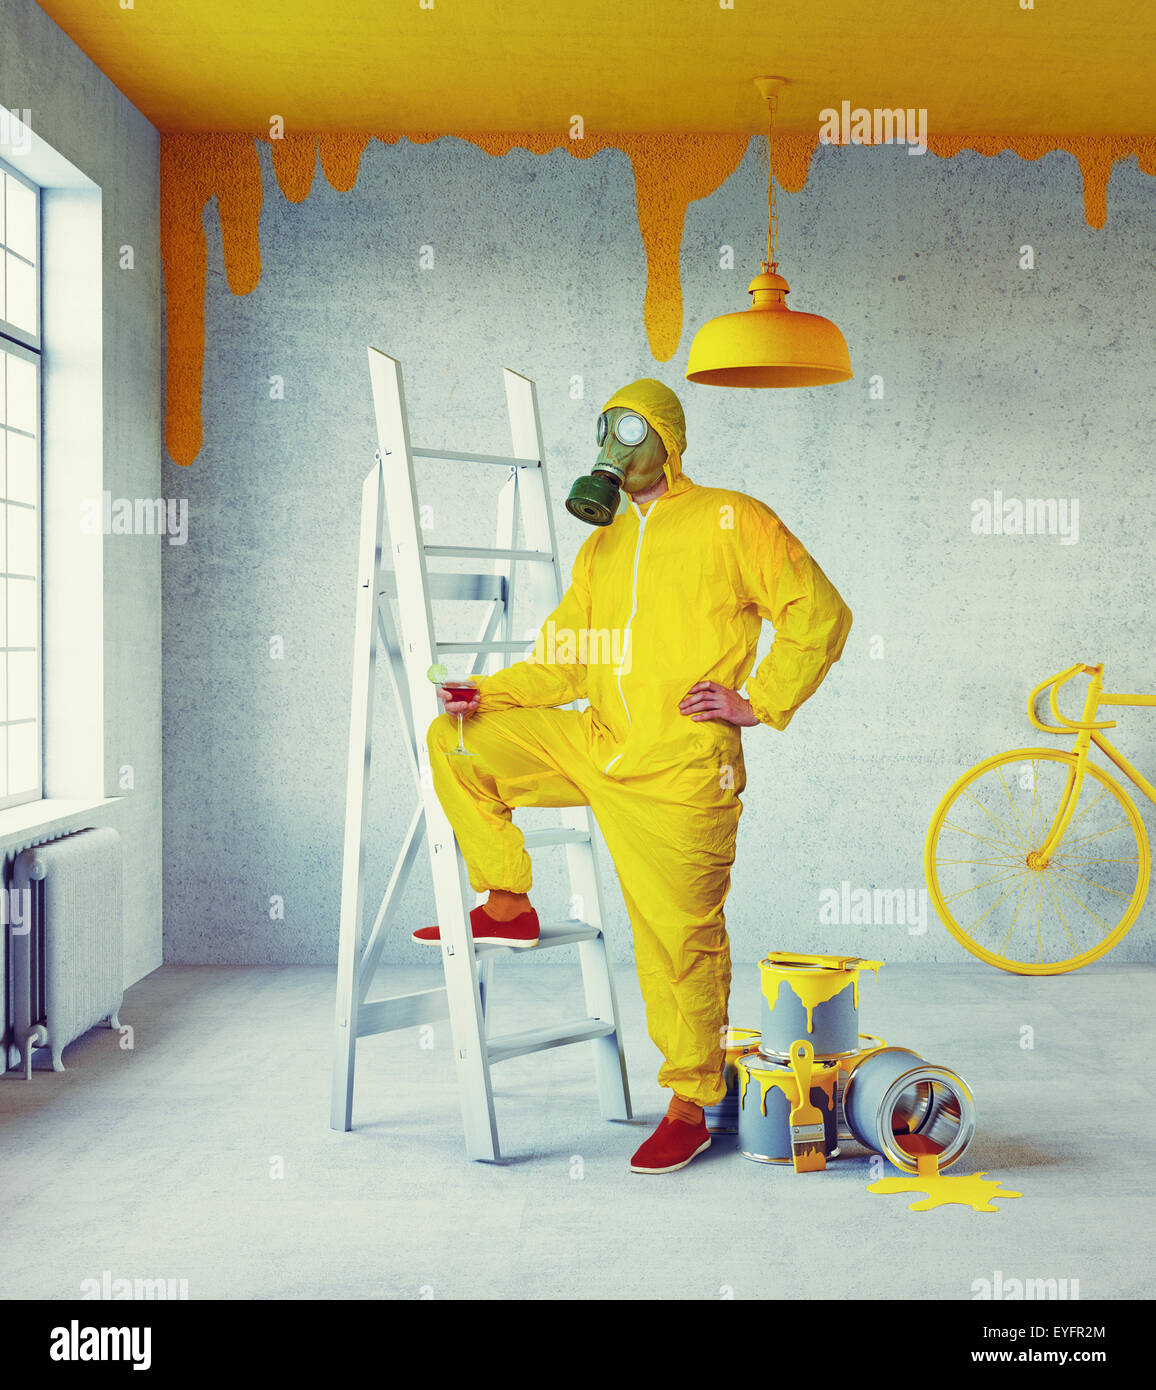 yellow painter - Stock Image